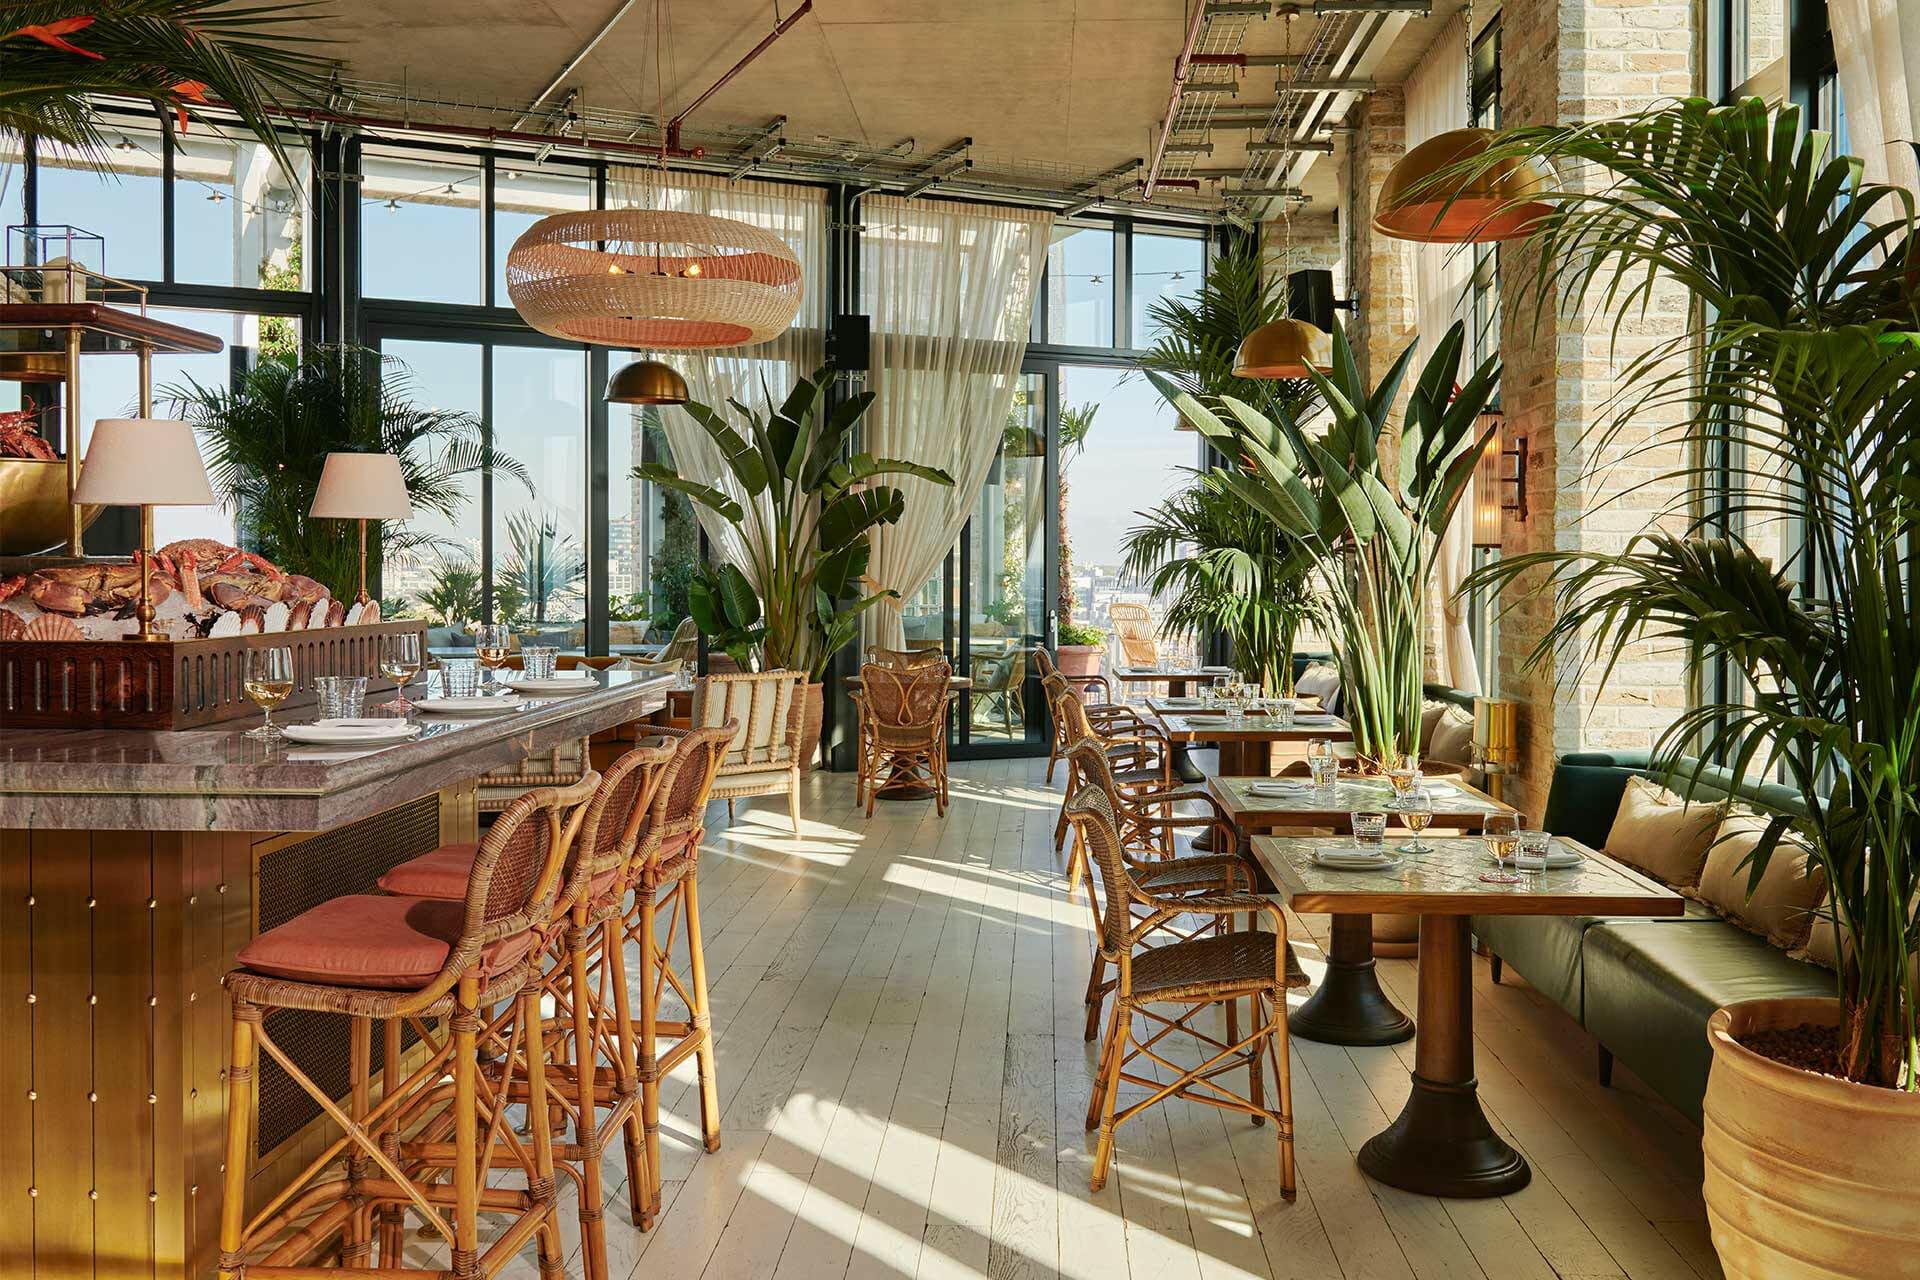 Seabird restaurant